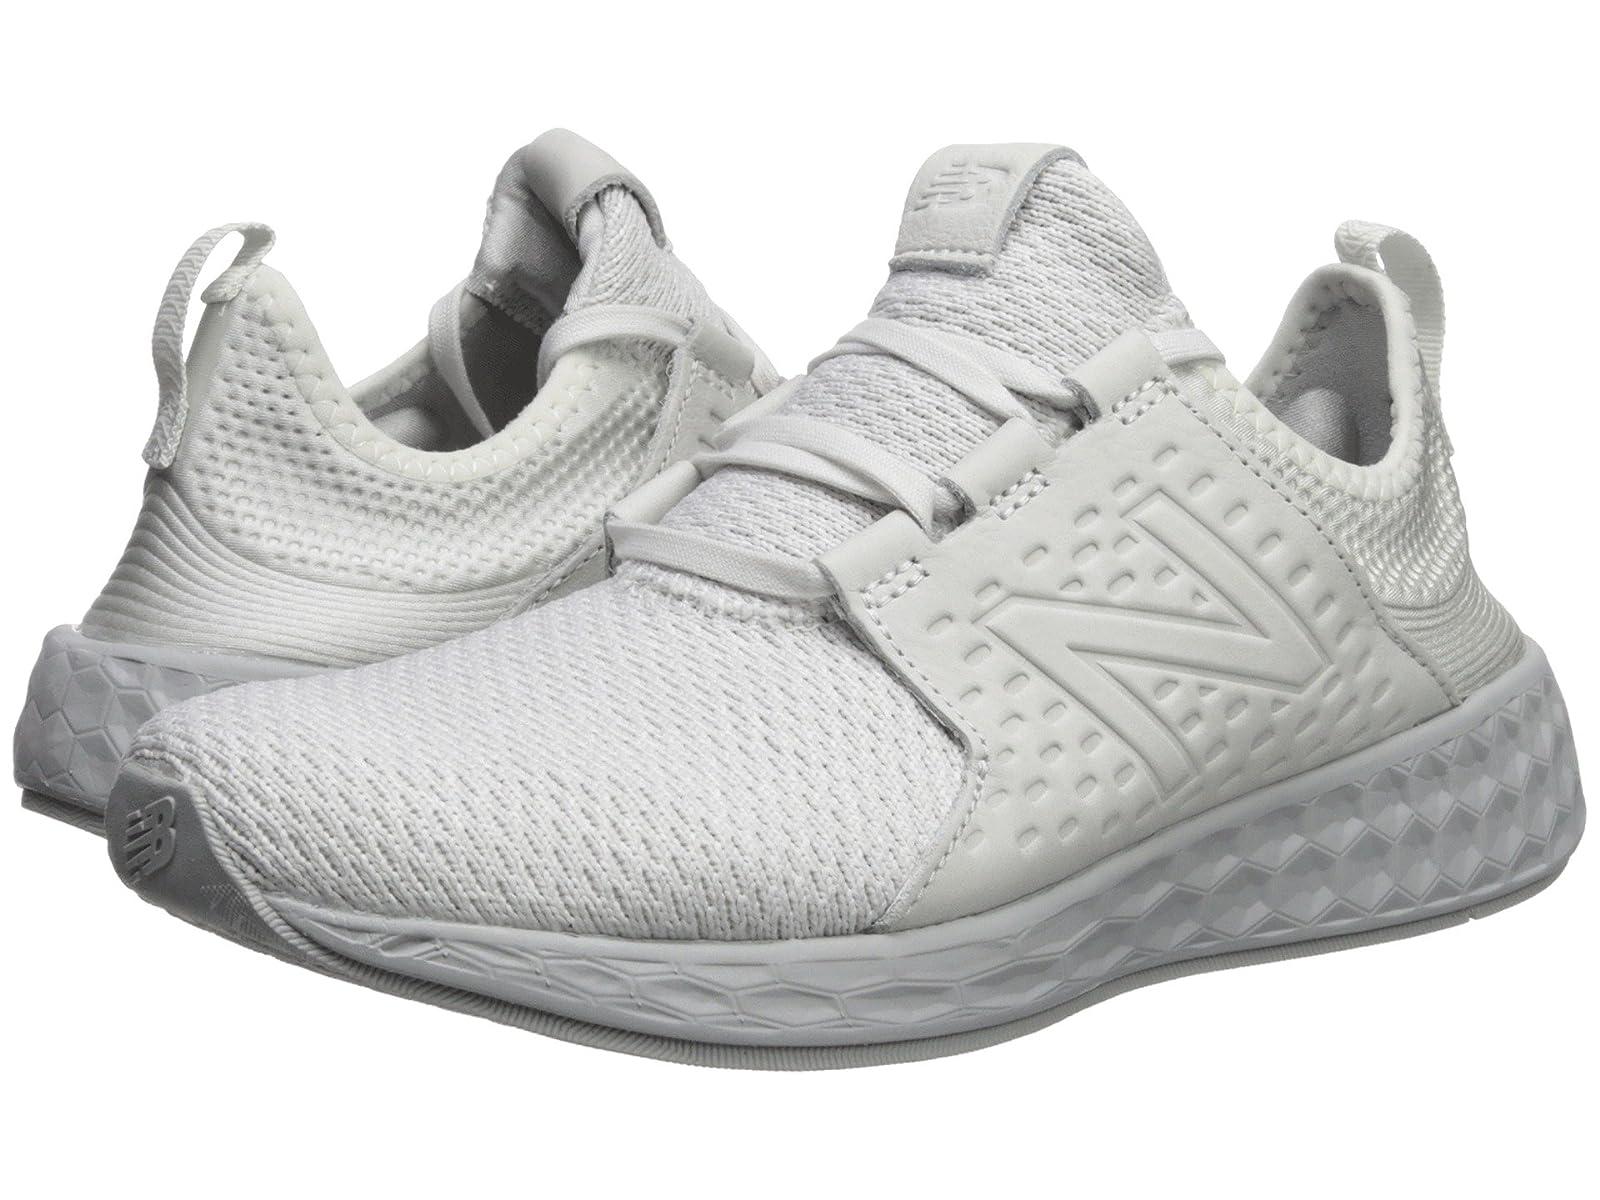 New Balance Fresh Foam Cruz v1Atmospheric grades have affordable shoes